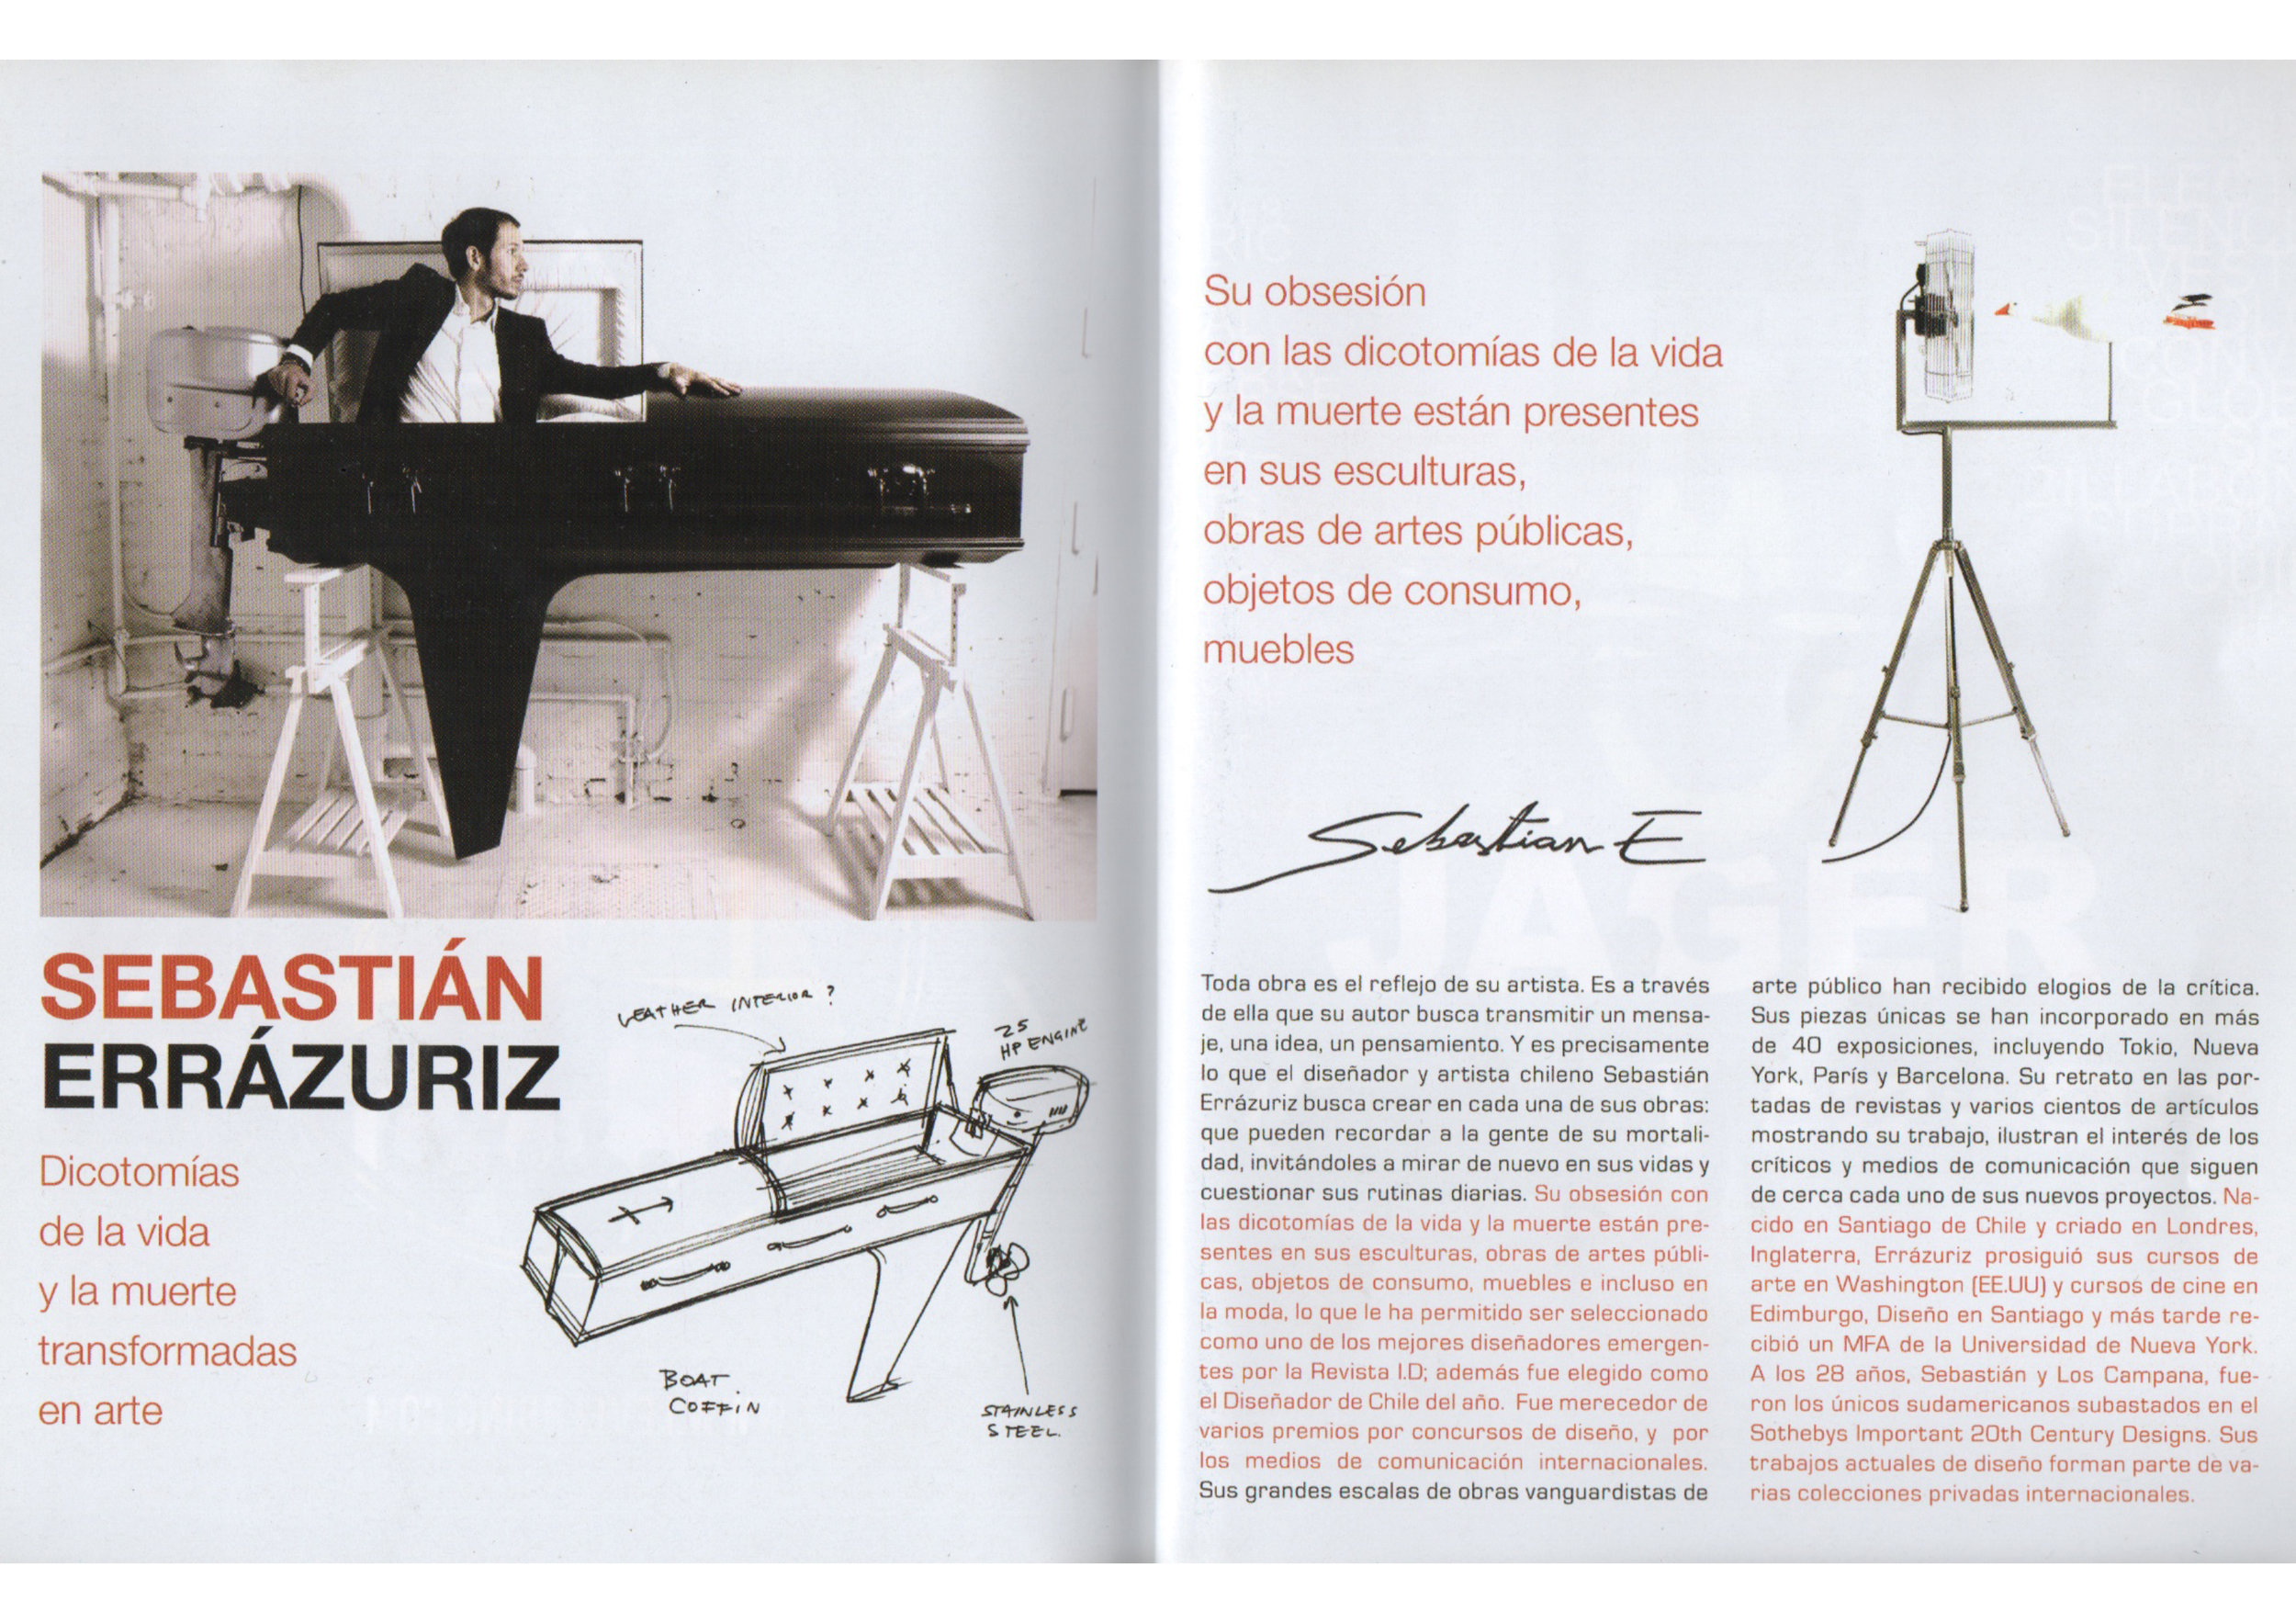 covermagazine2012.jpg